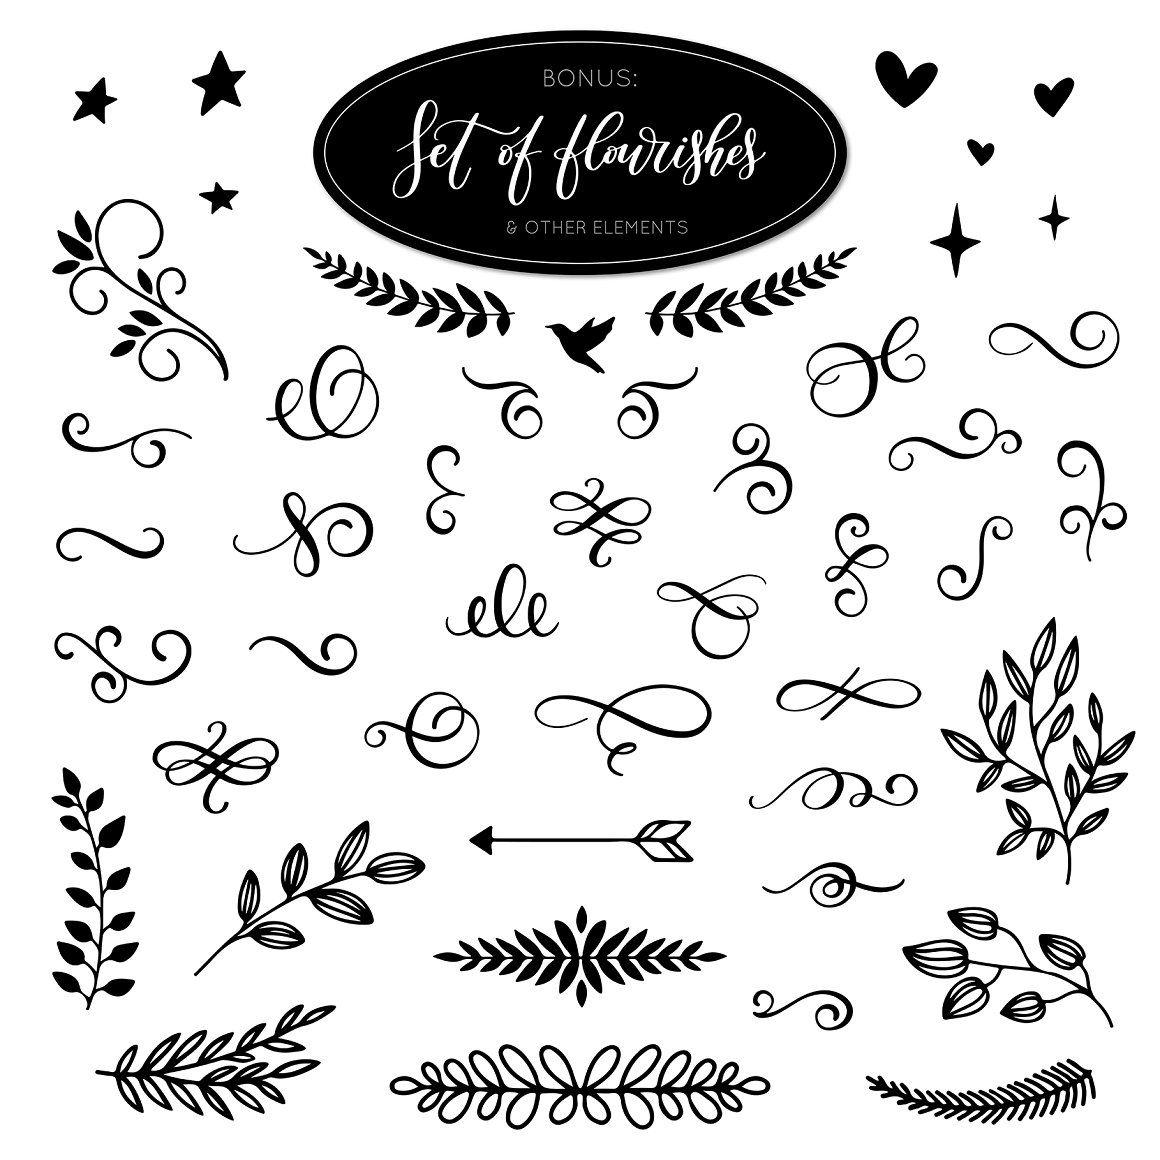 Inspirational Calligraphy Quotes By Hakuna Matata Thehungryjpeg Com